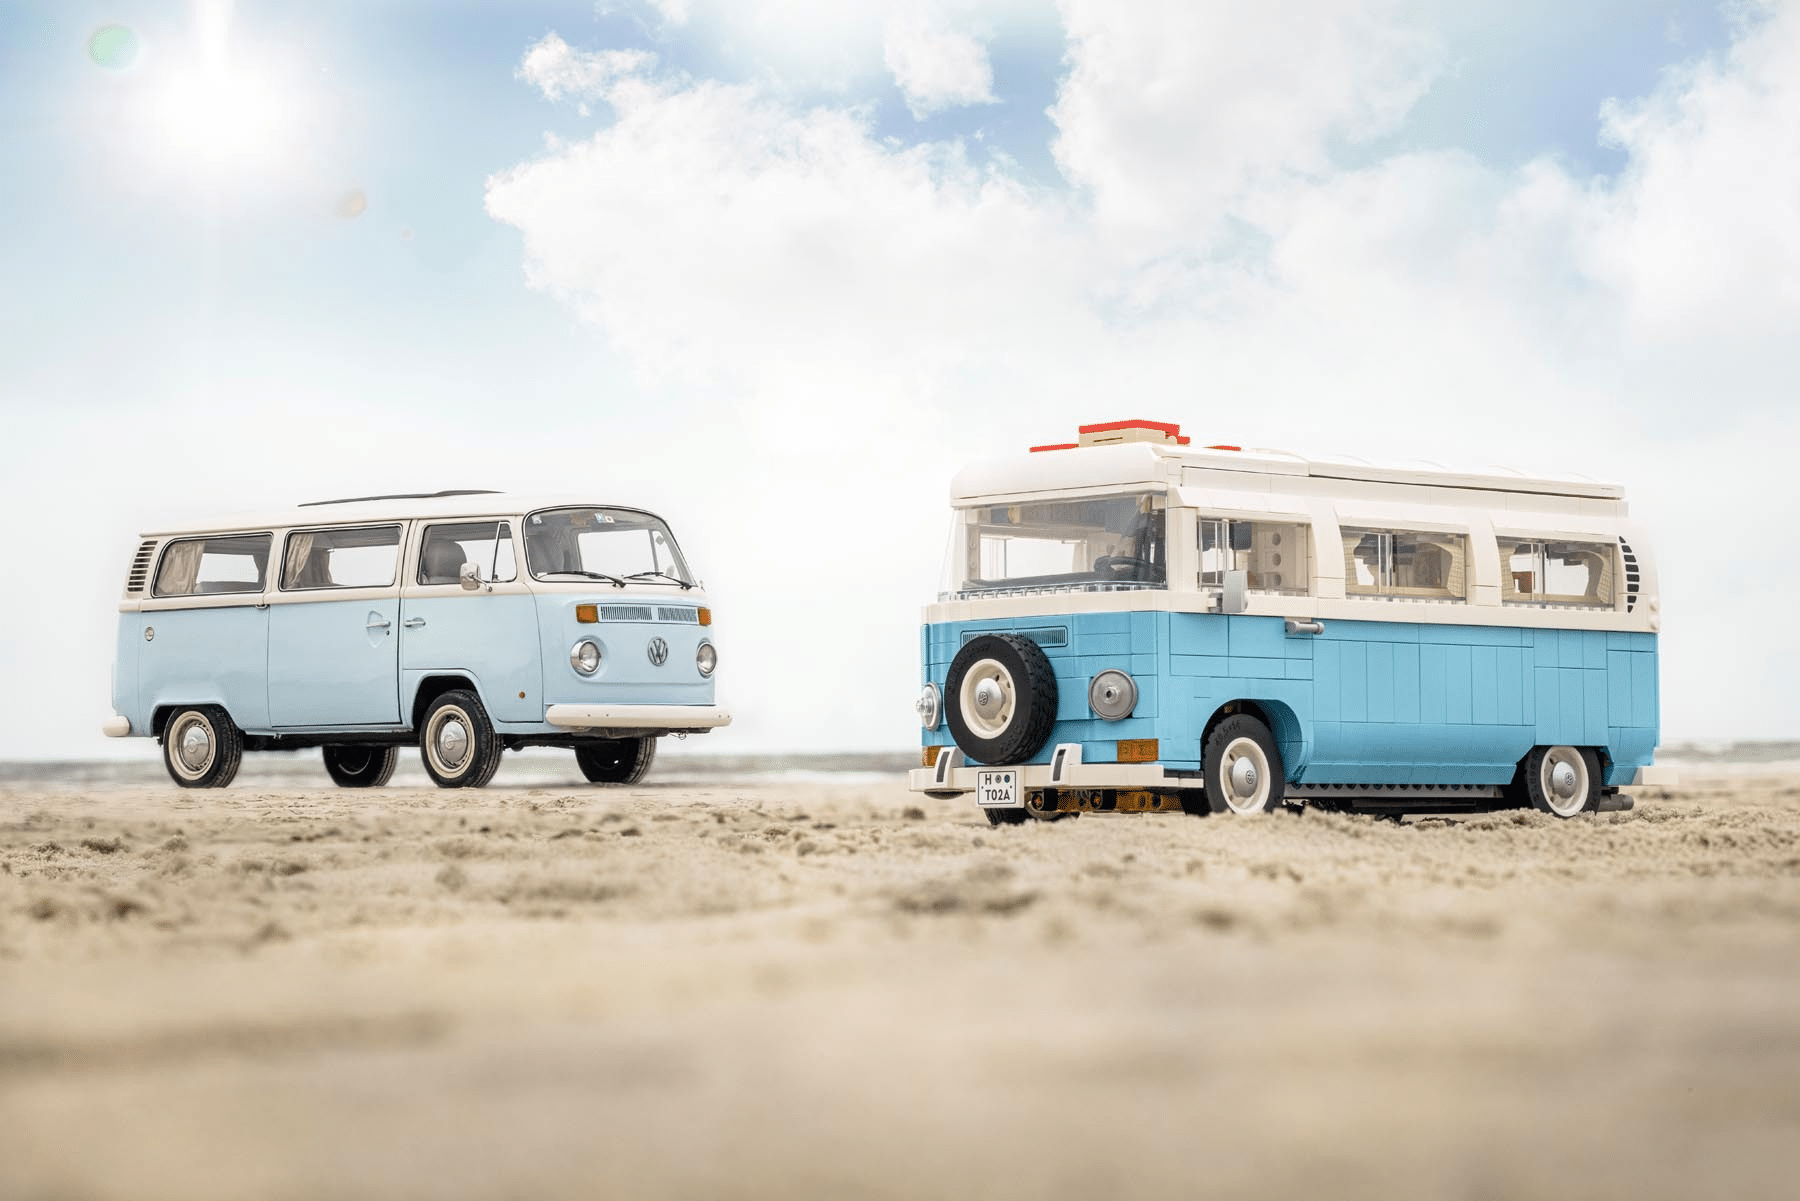 LEGO 10279 Volkswagen T2 Campingbus Vergleich Vorbild